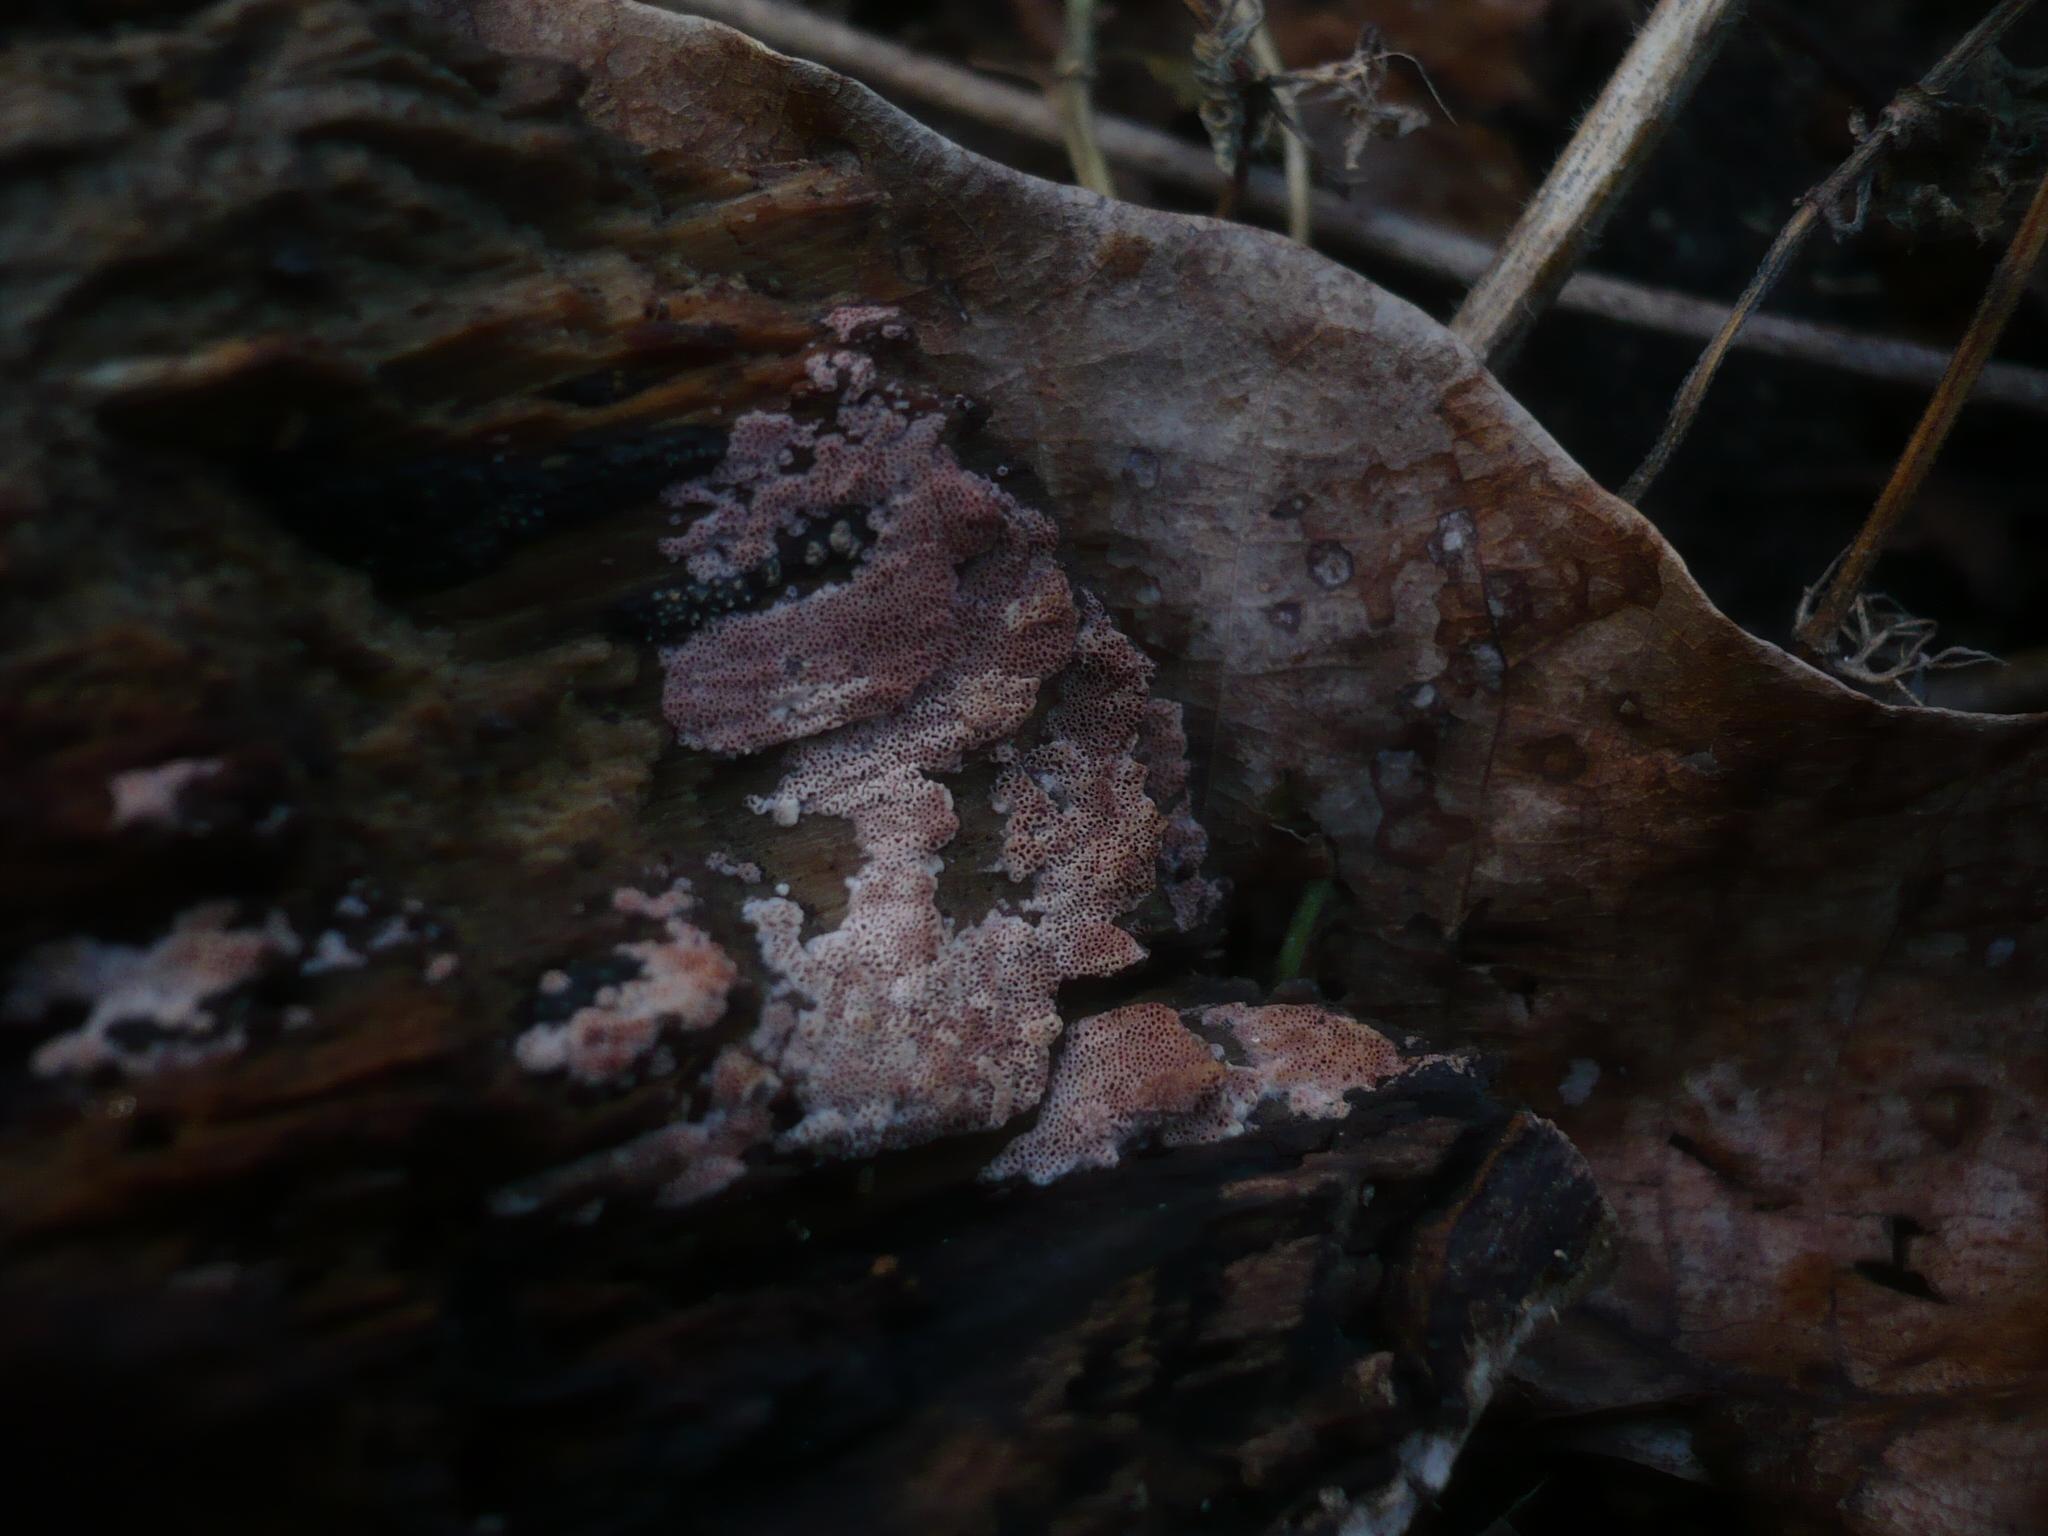 Ceriporia purpurea image